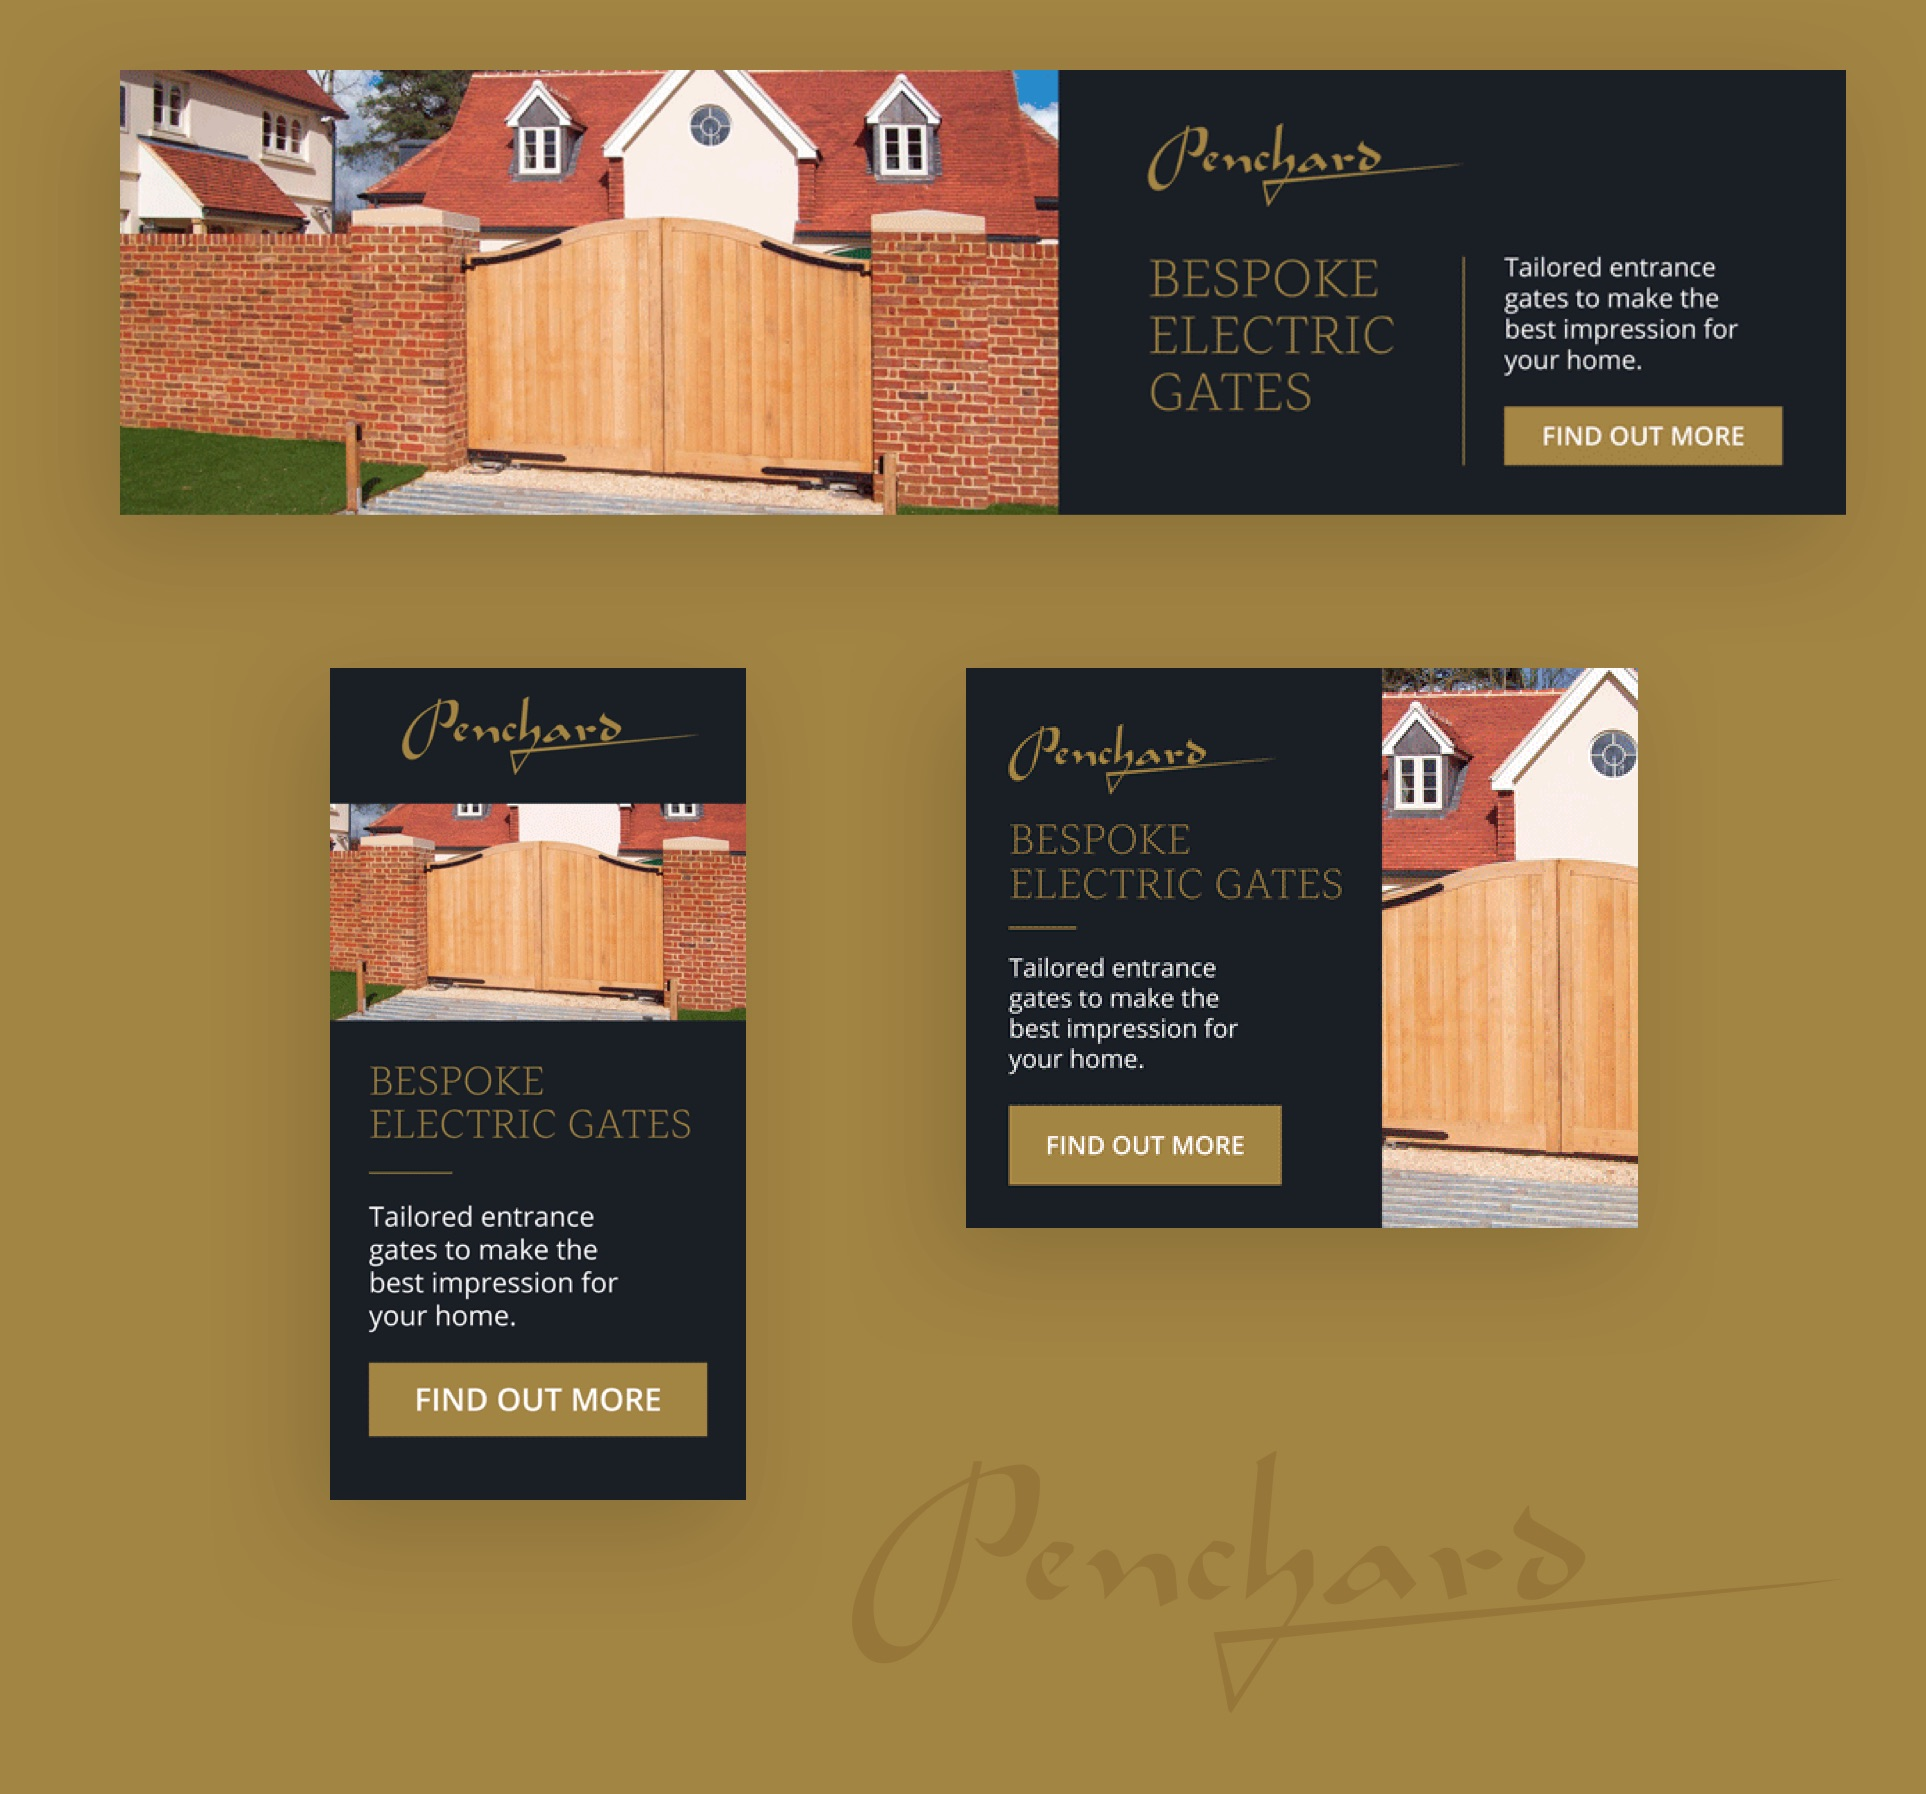 Penchard Gates brochures